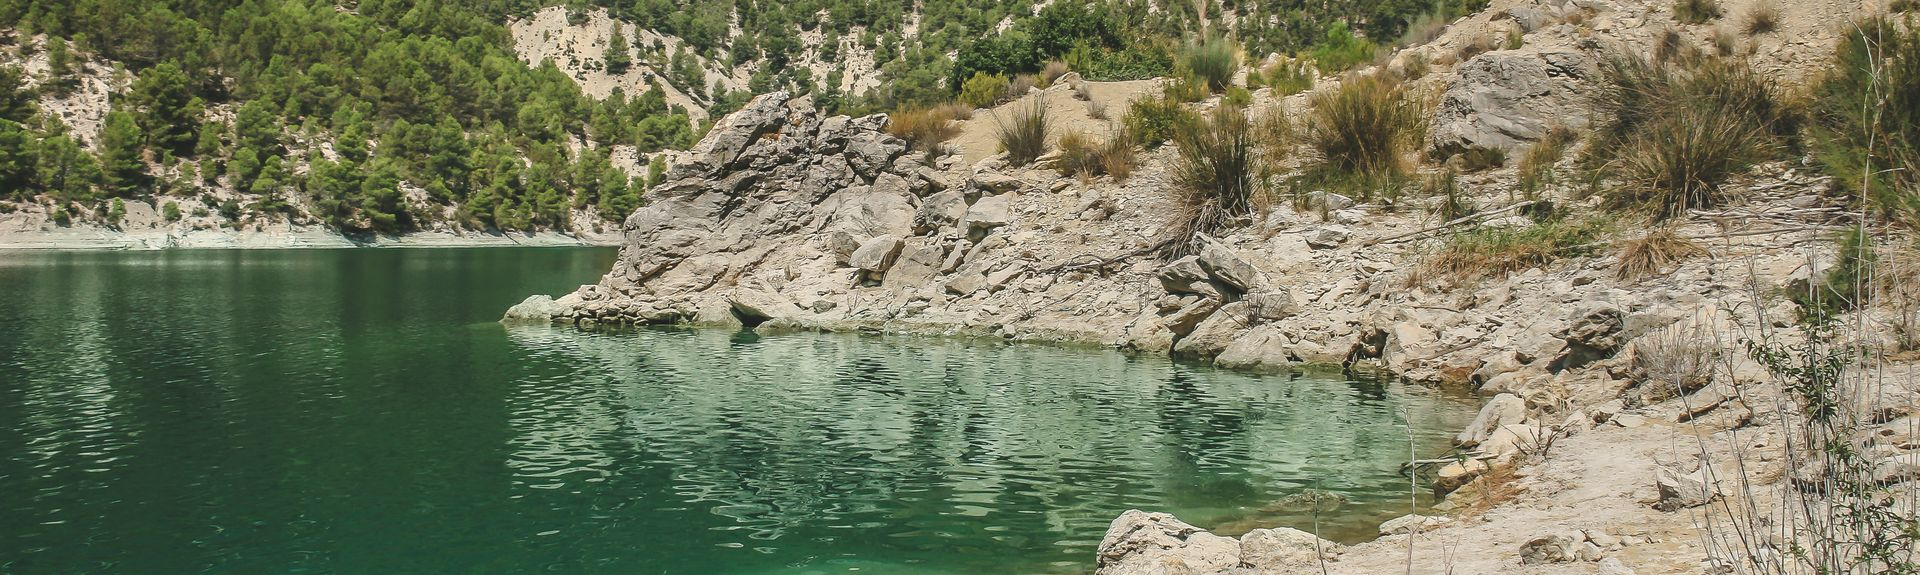 Cortes de Baza, Andalusia, Spain